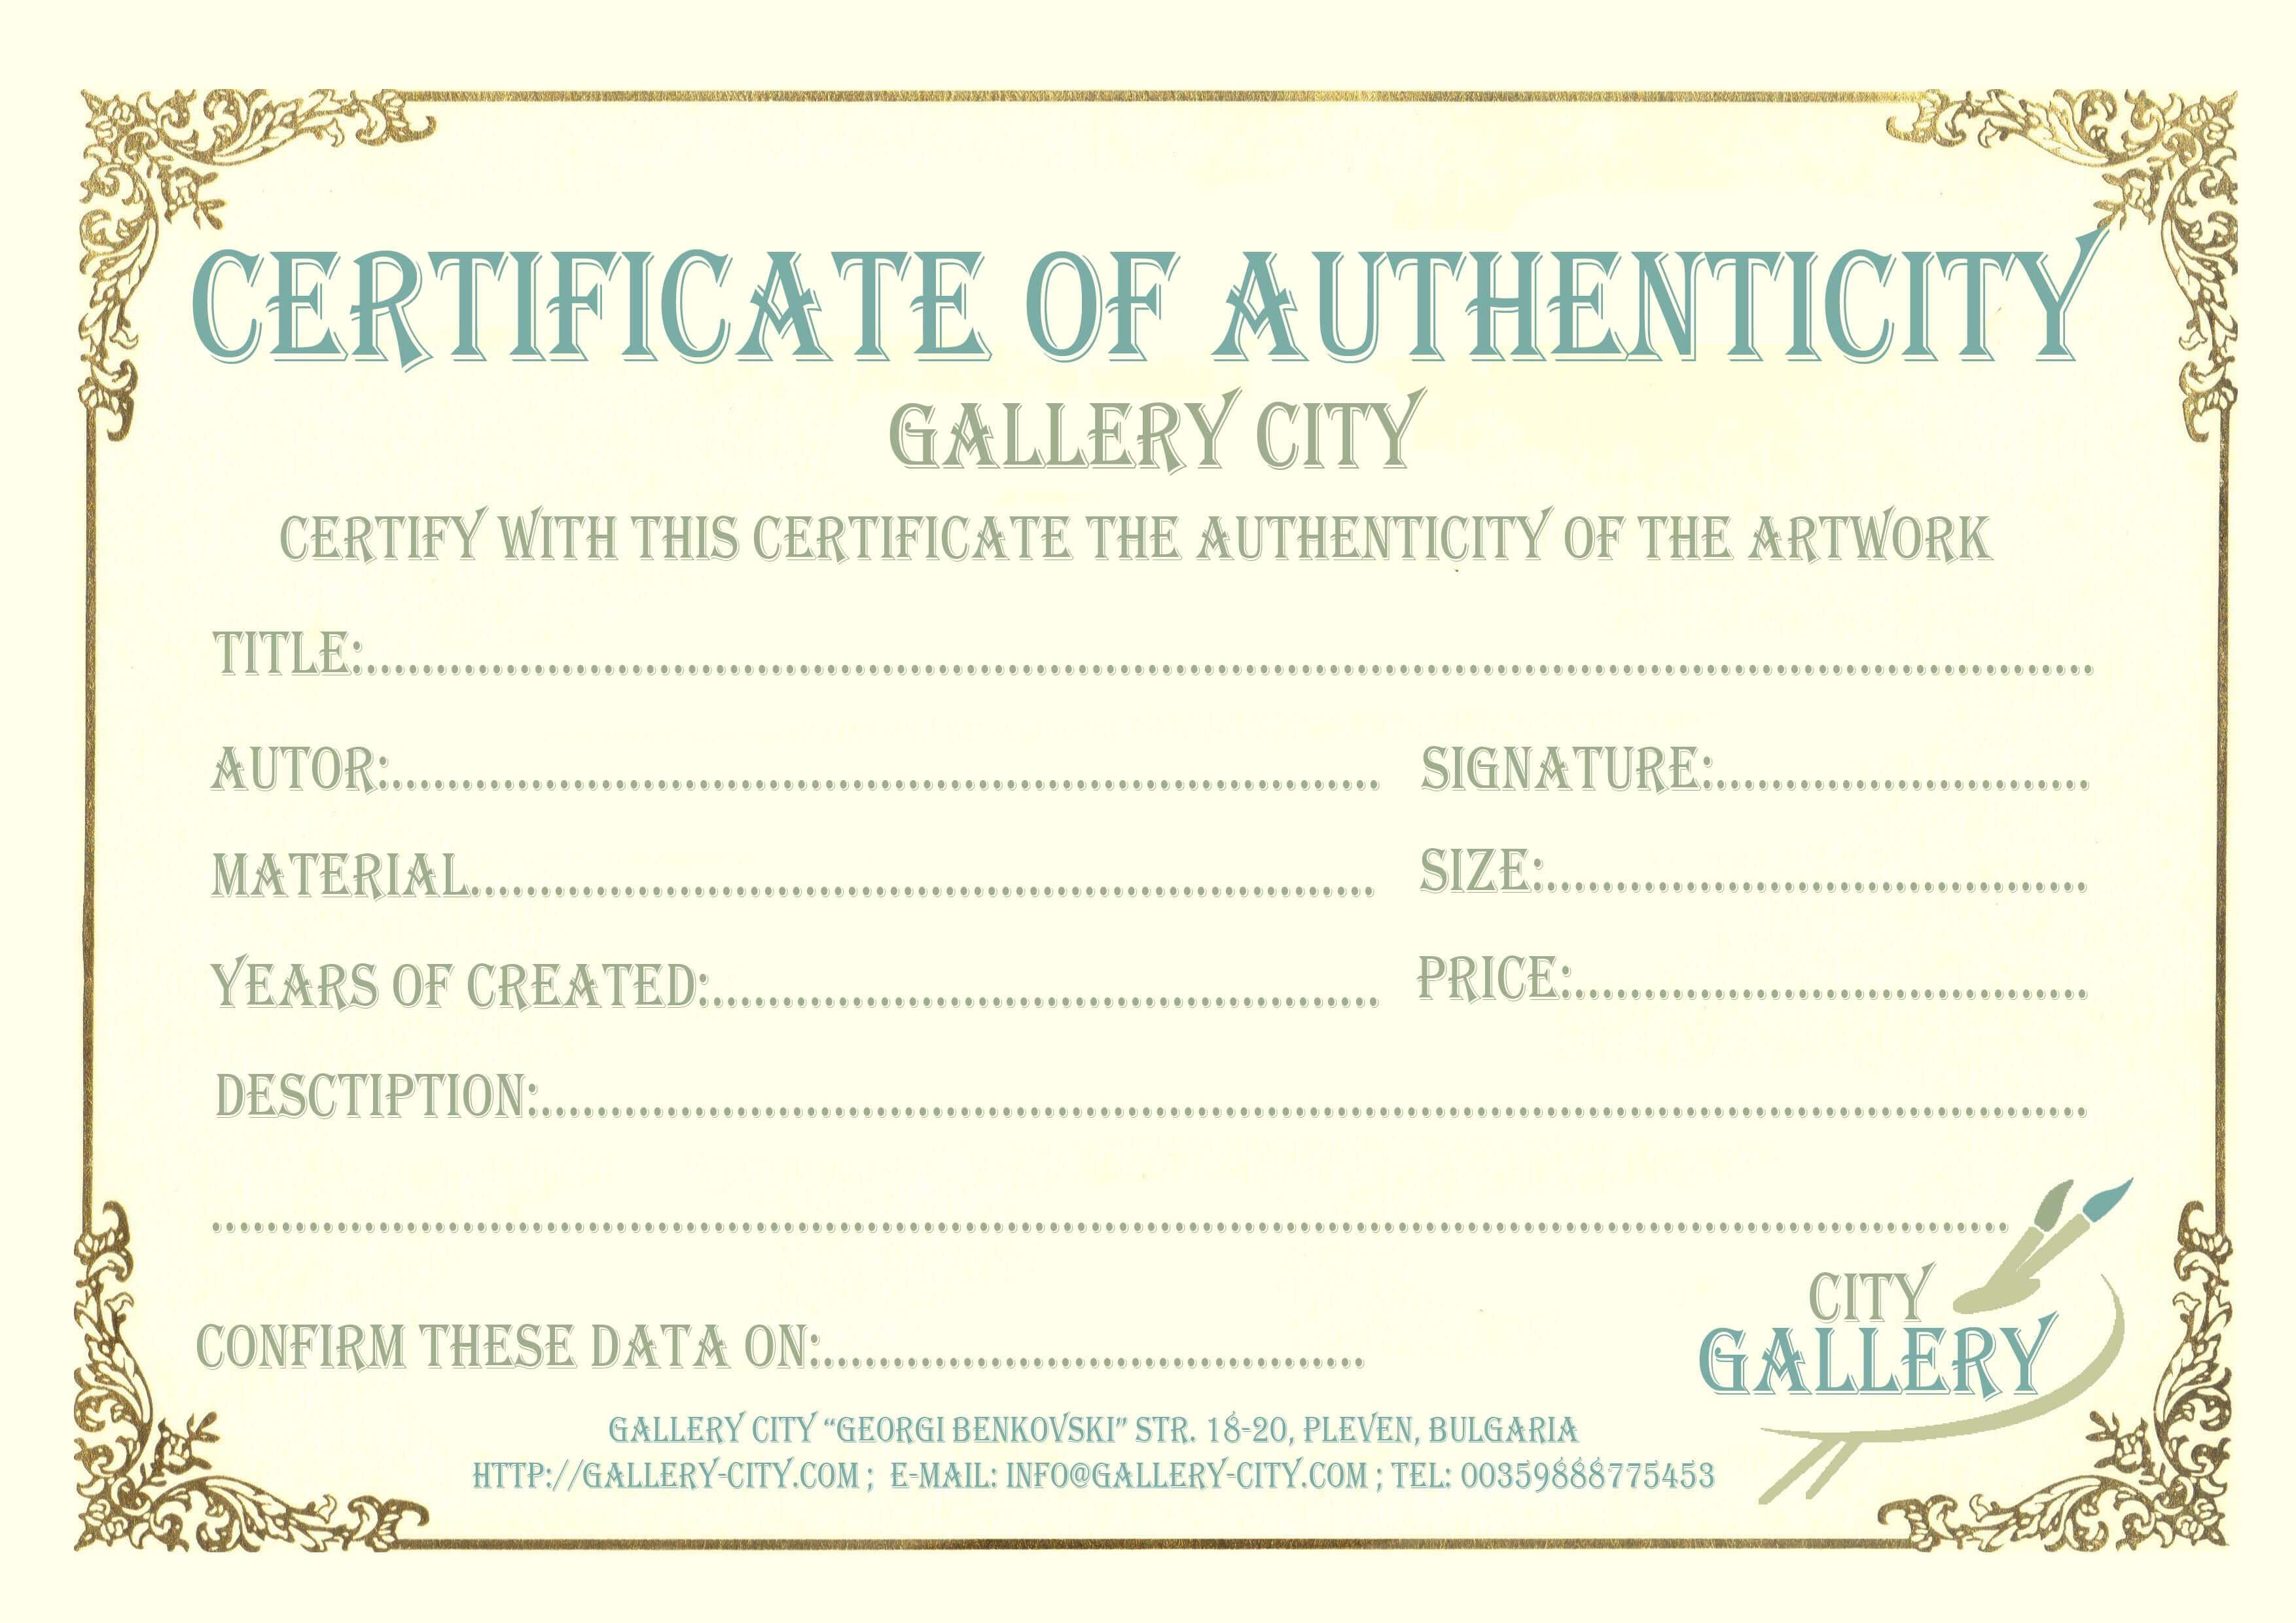 Certificate Authenticity Template Art Authenticity in Life Saving Award Certificate Template